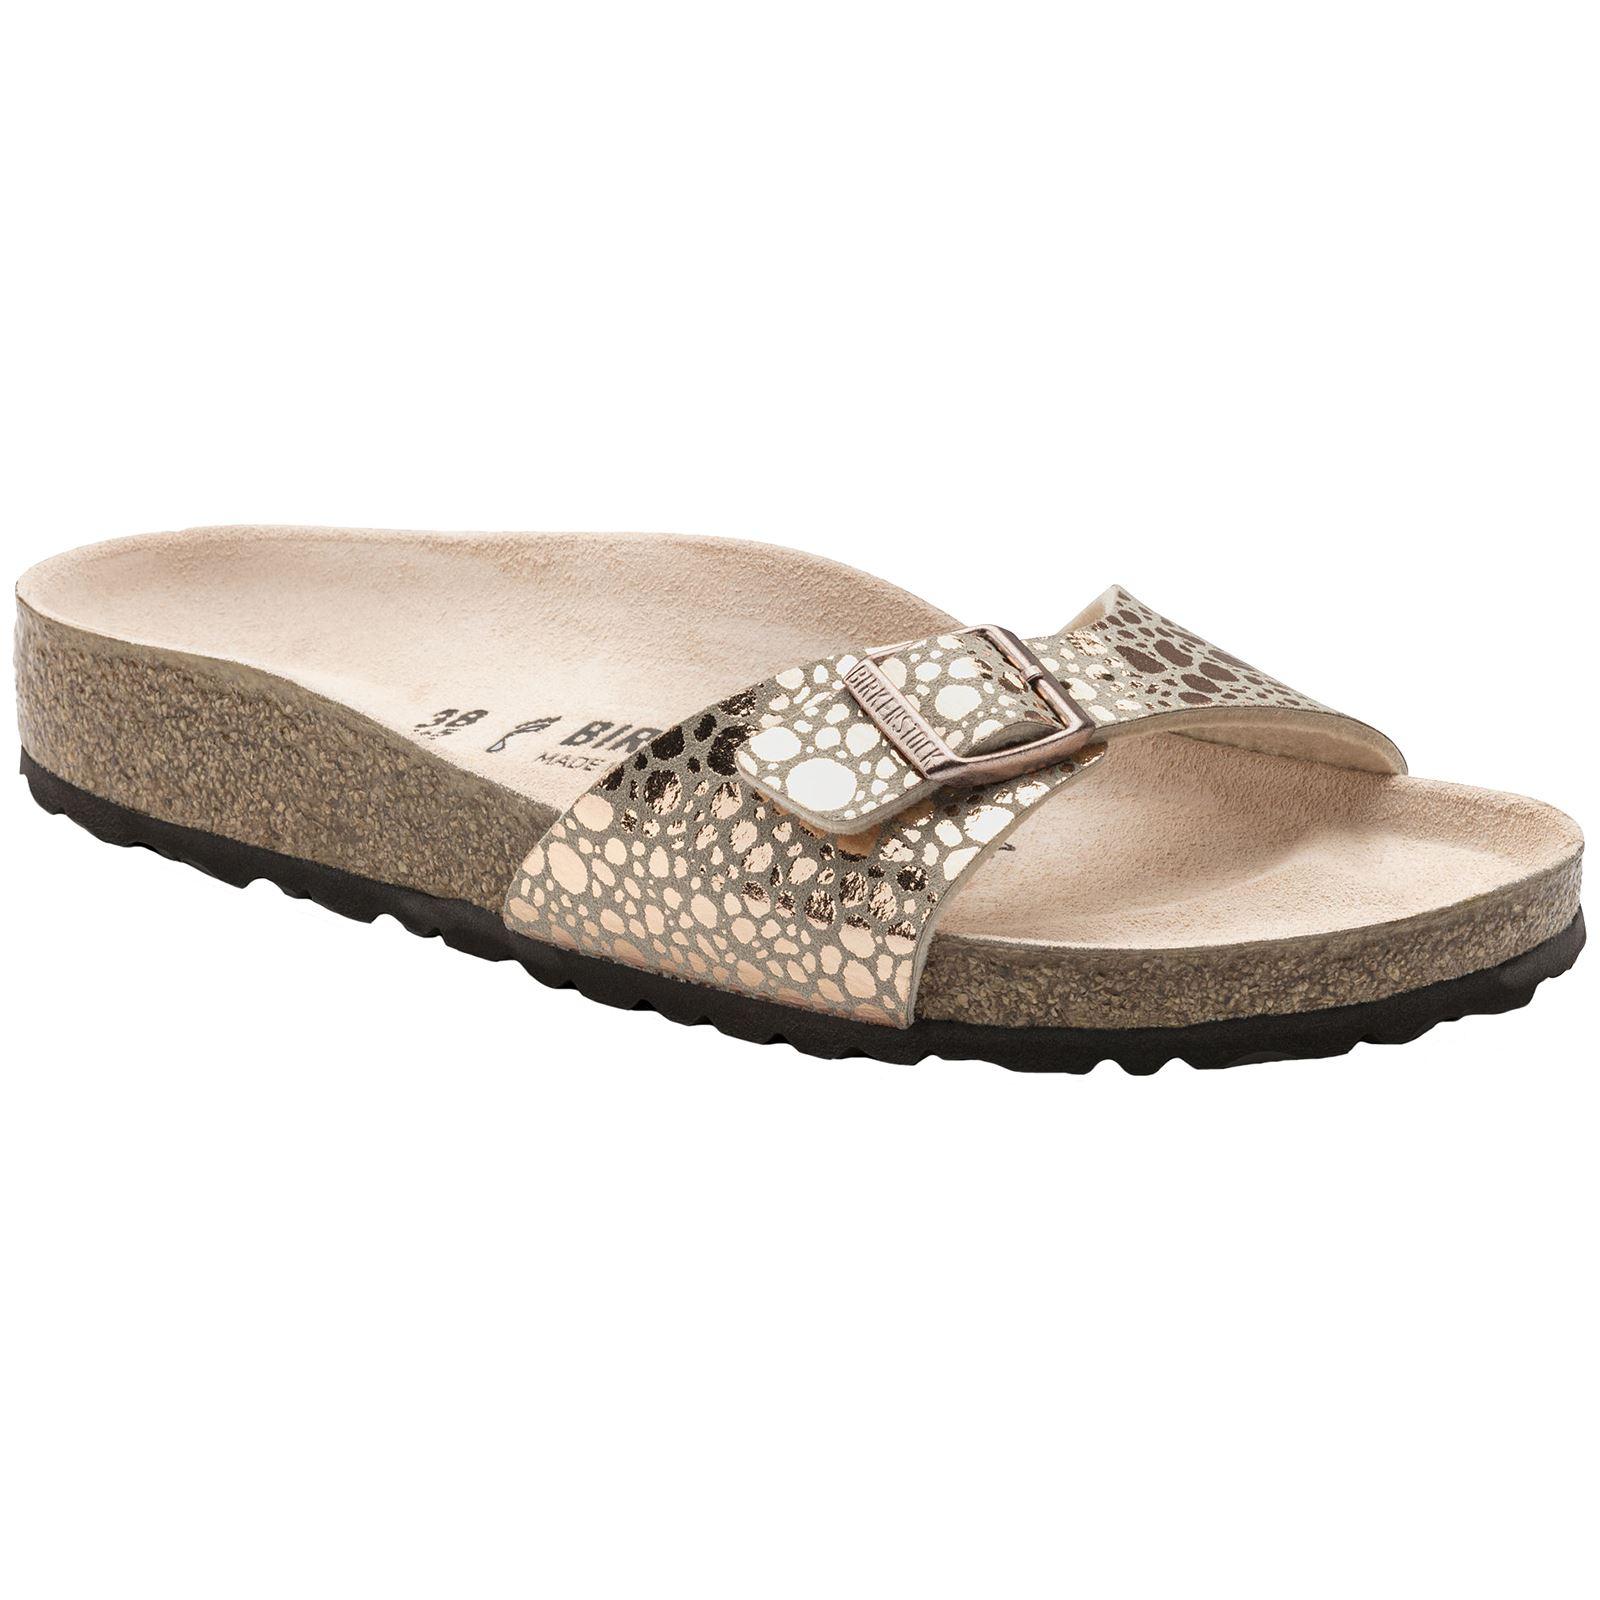 4181f40fb8b9 Birkenstock Madrid Metallic Stones Copper Womens Birko-Flor Open-Back  Sandals